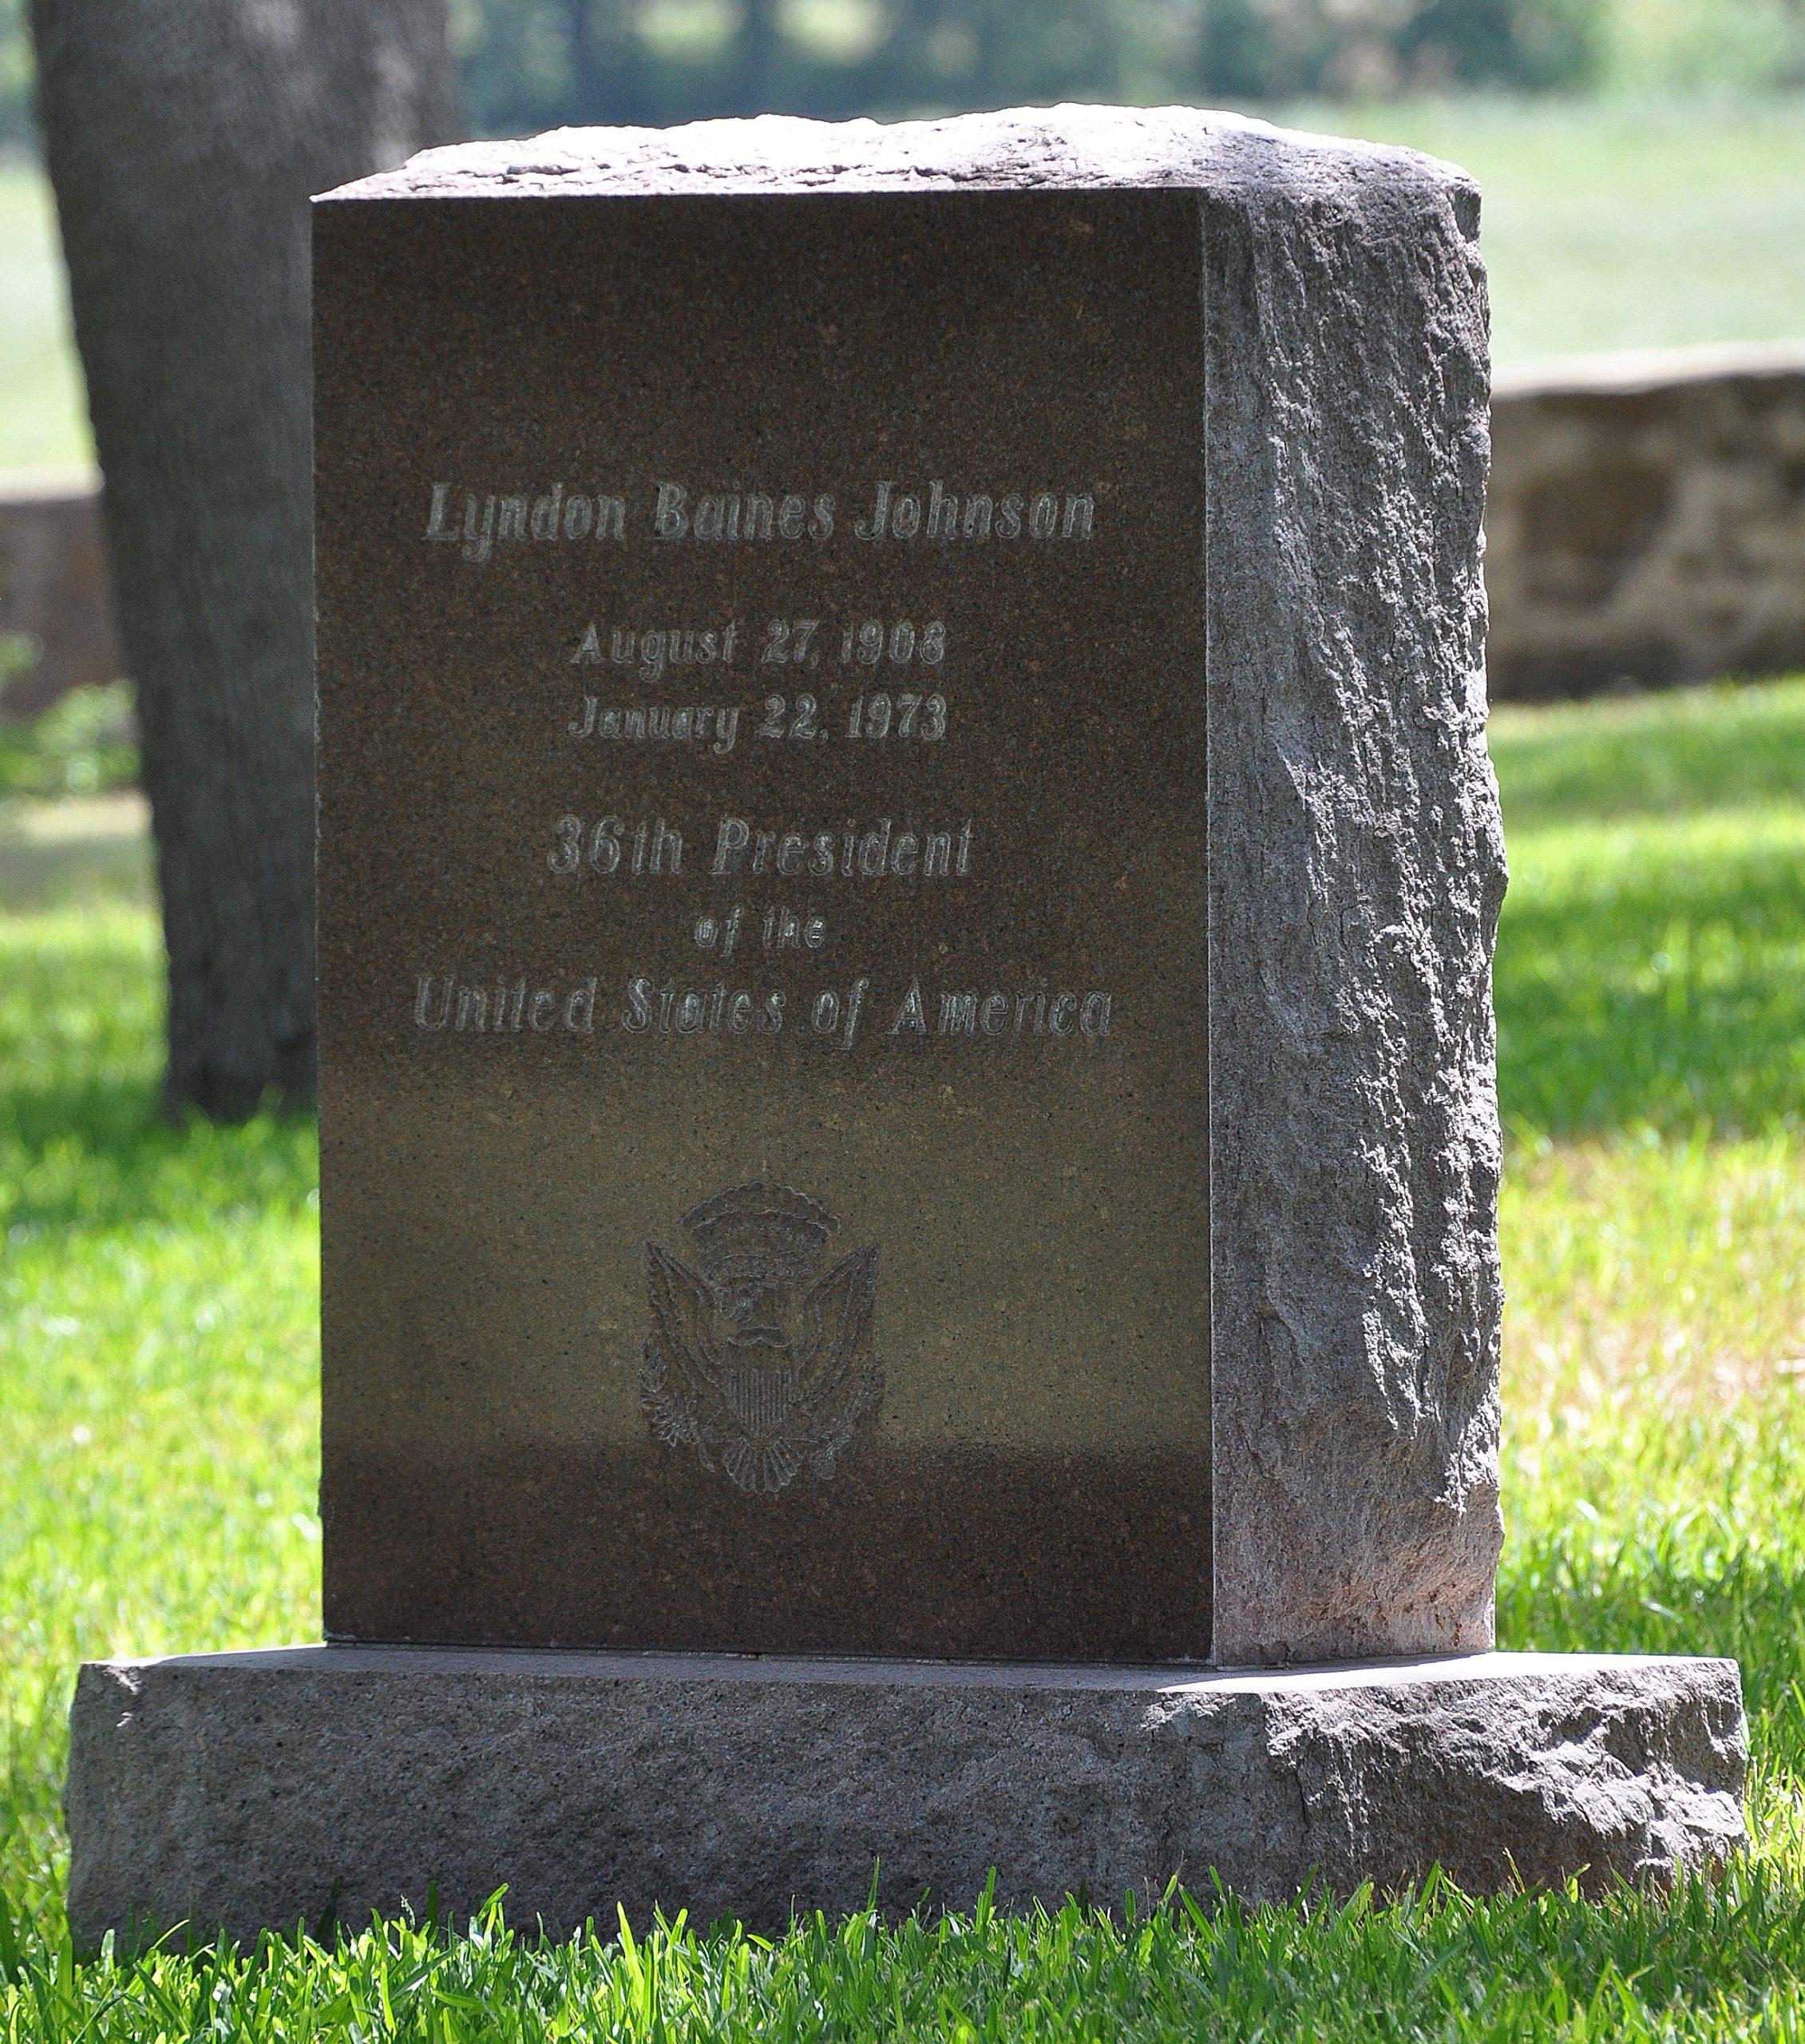 LBJ Gravesite